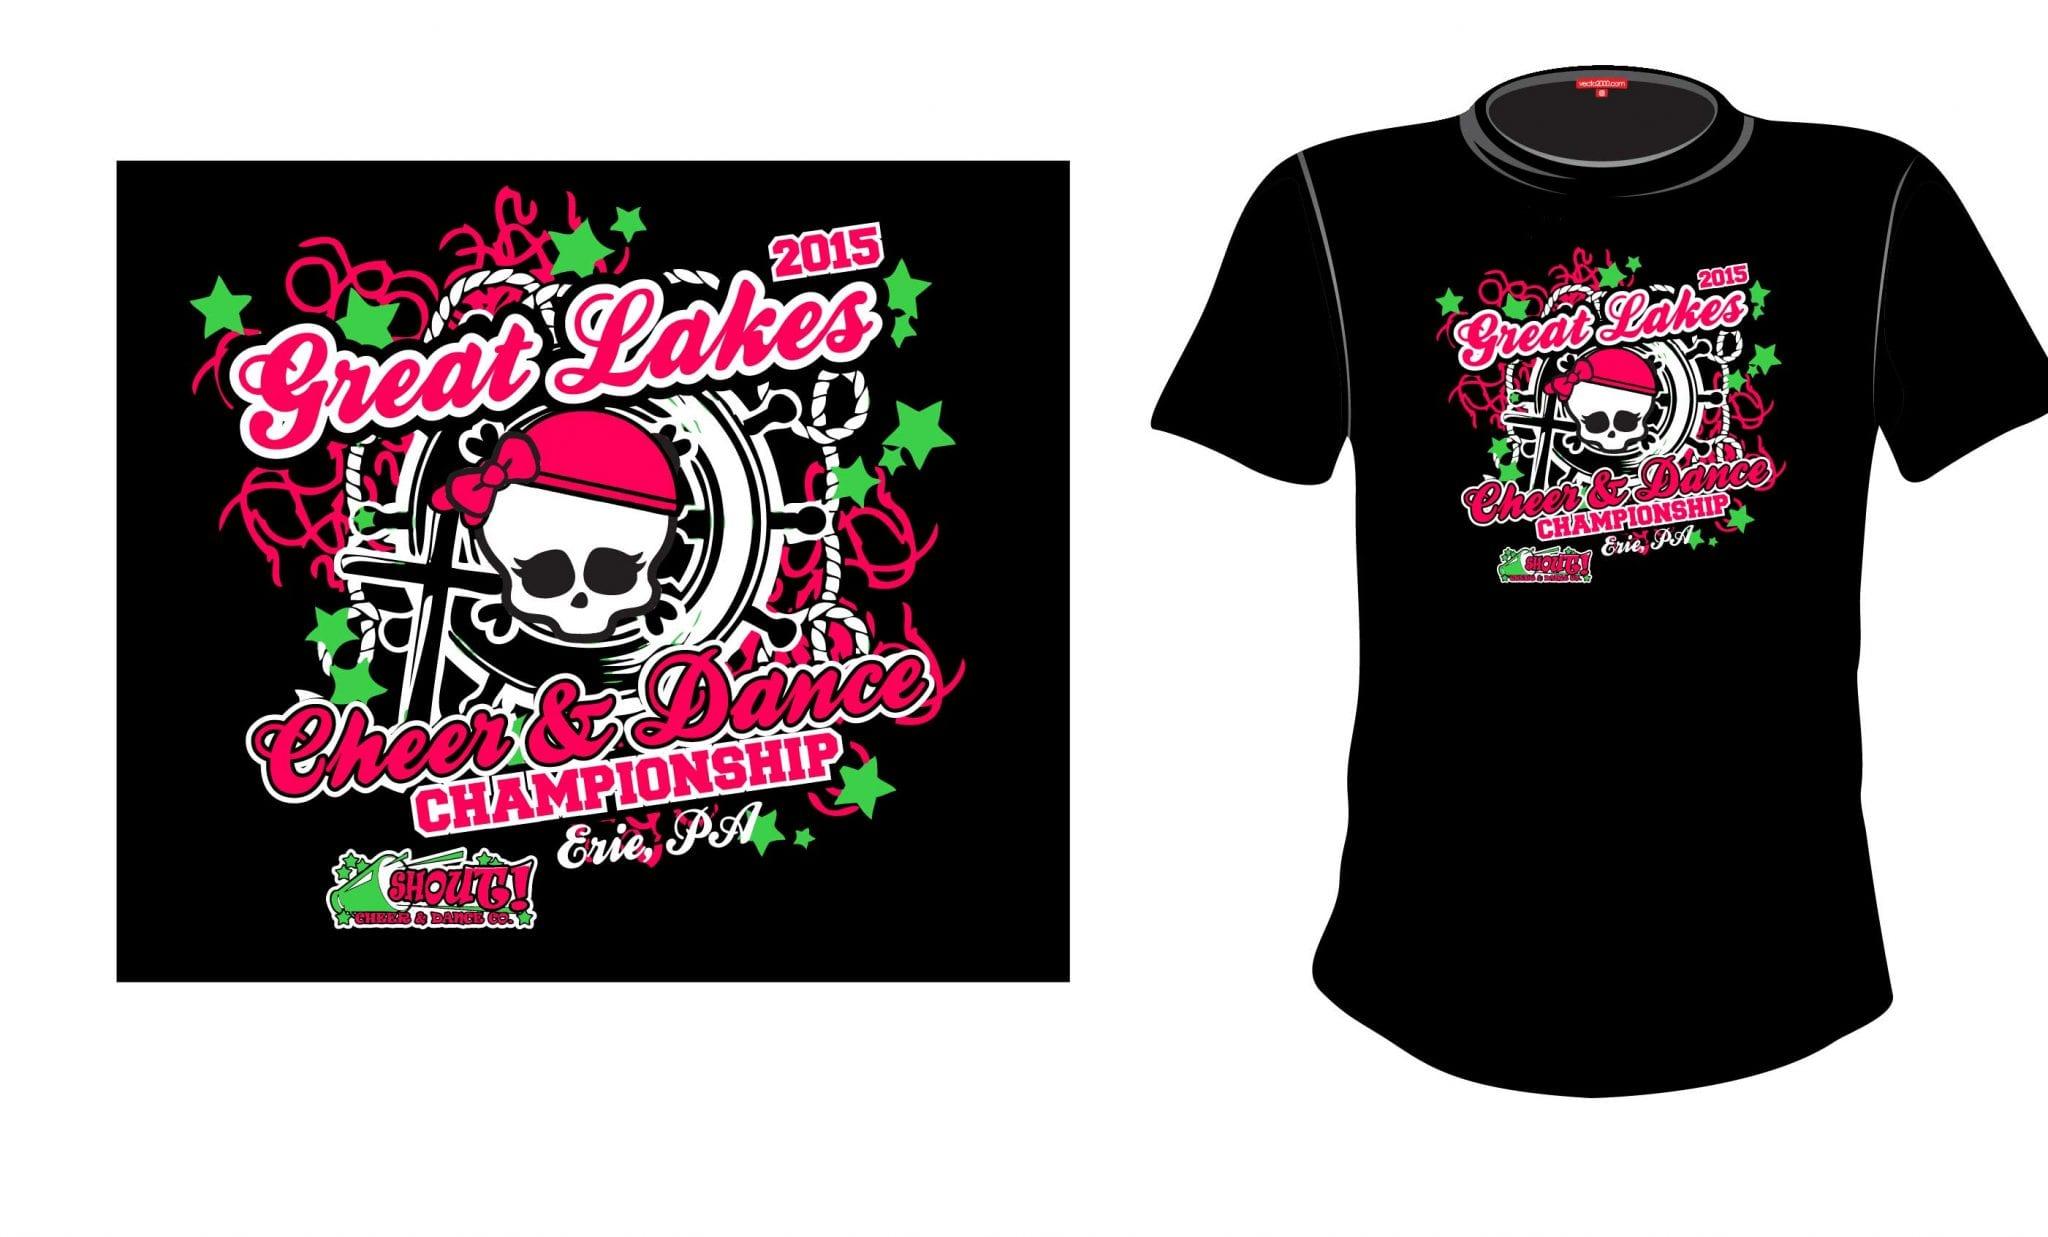 2015 Great Lakes Cheer and Dance Championship tshirt design